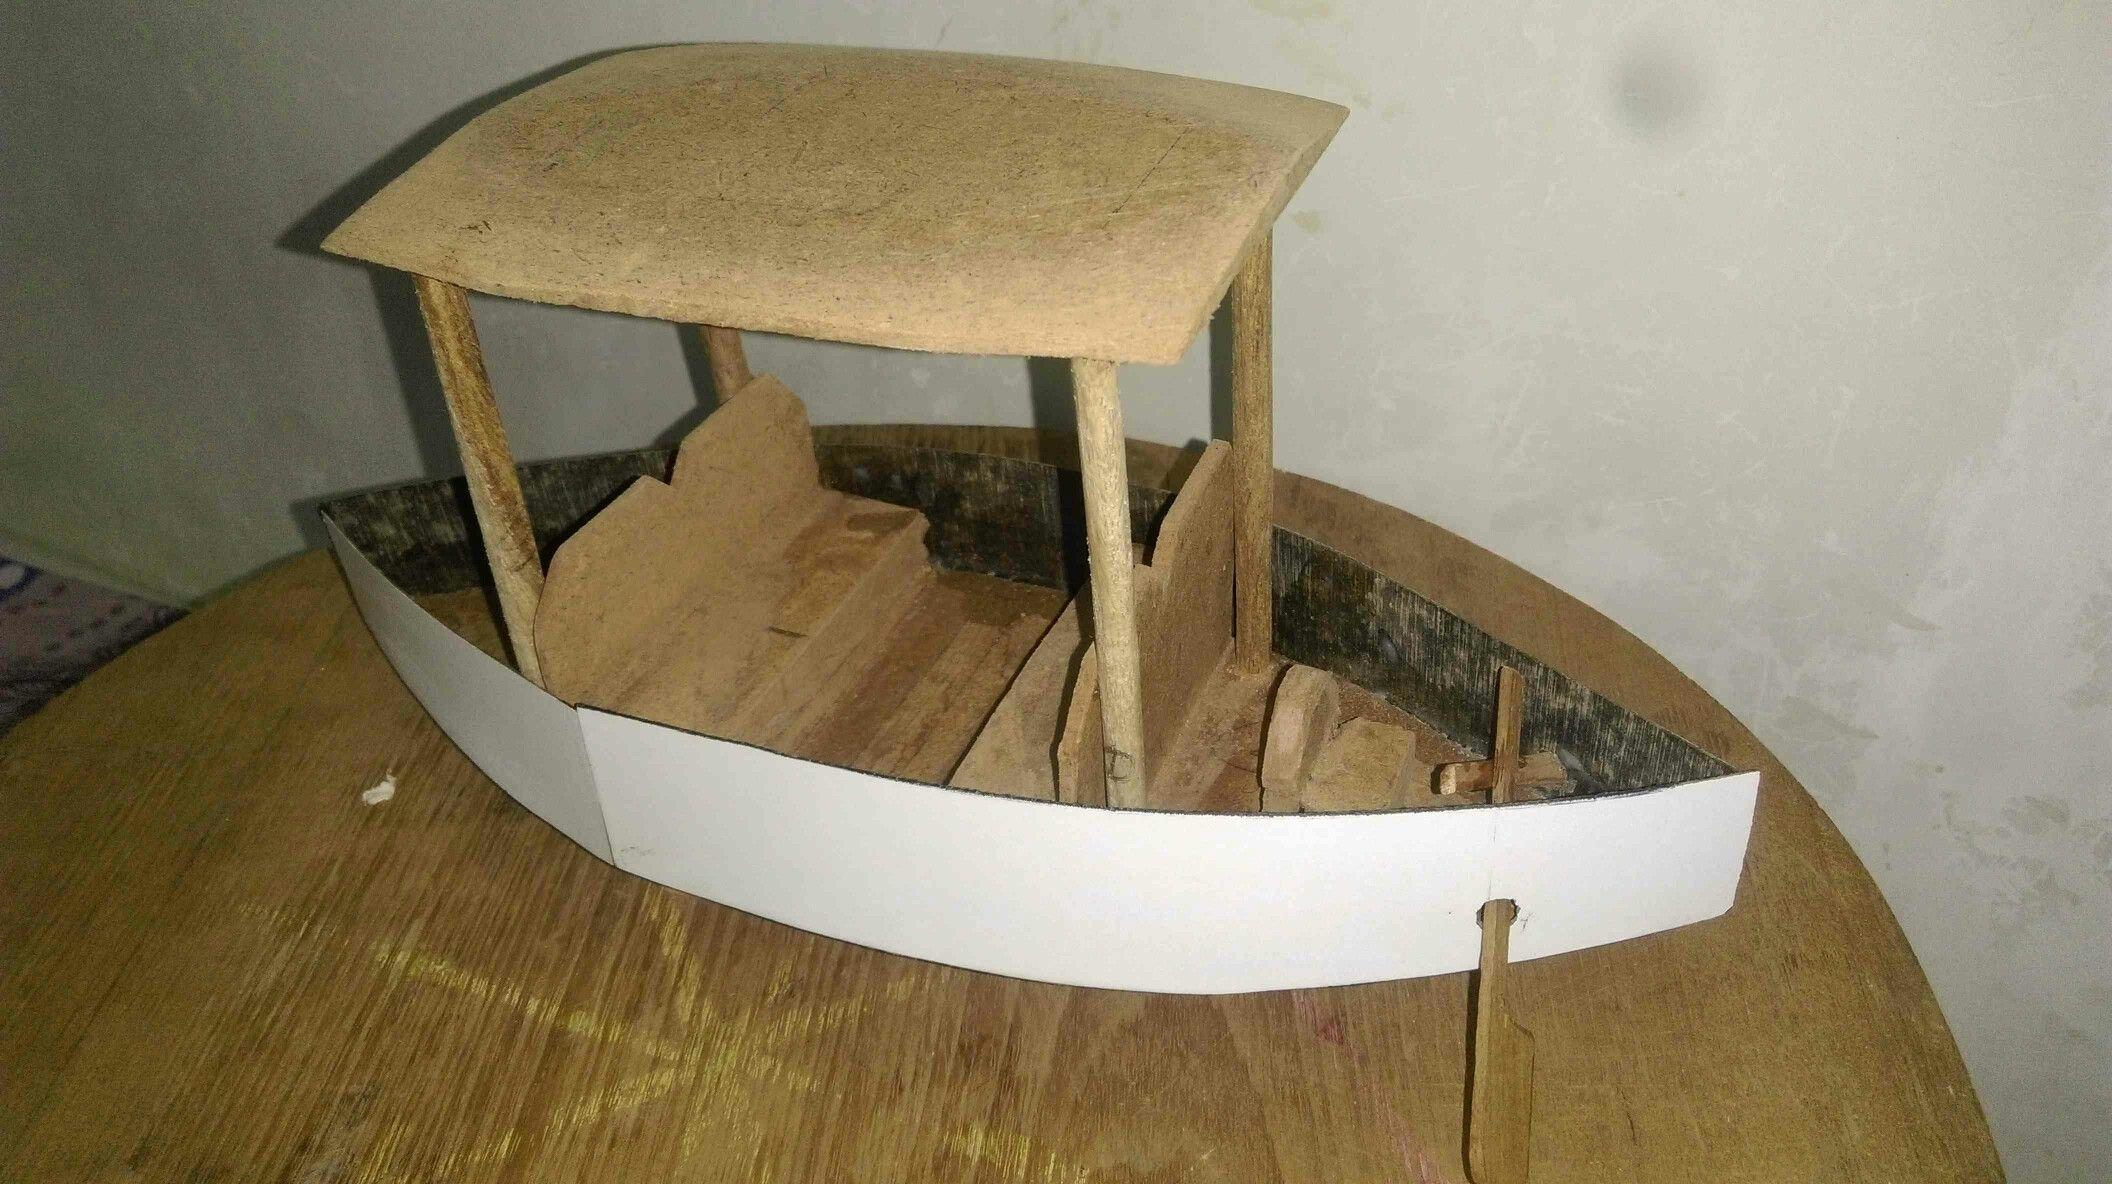 Pin by fernando pearson on wooden craft ideas pinterest wooden